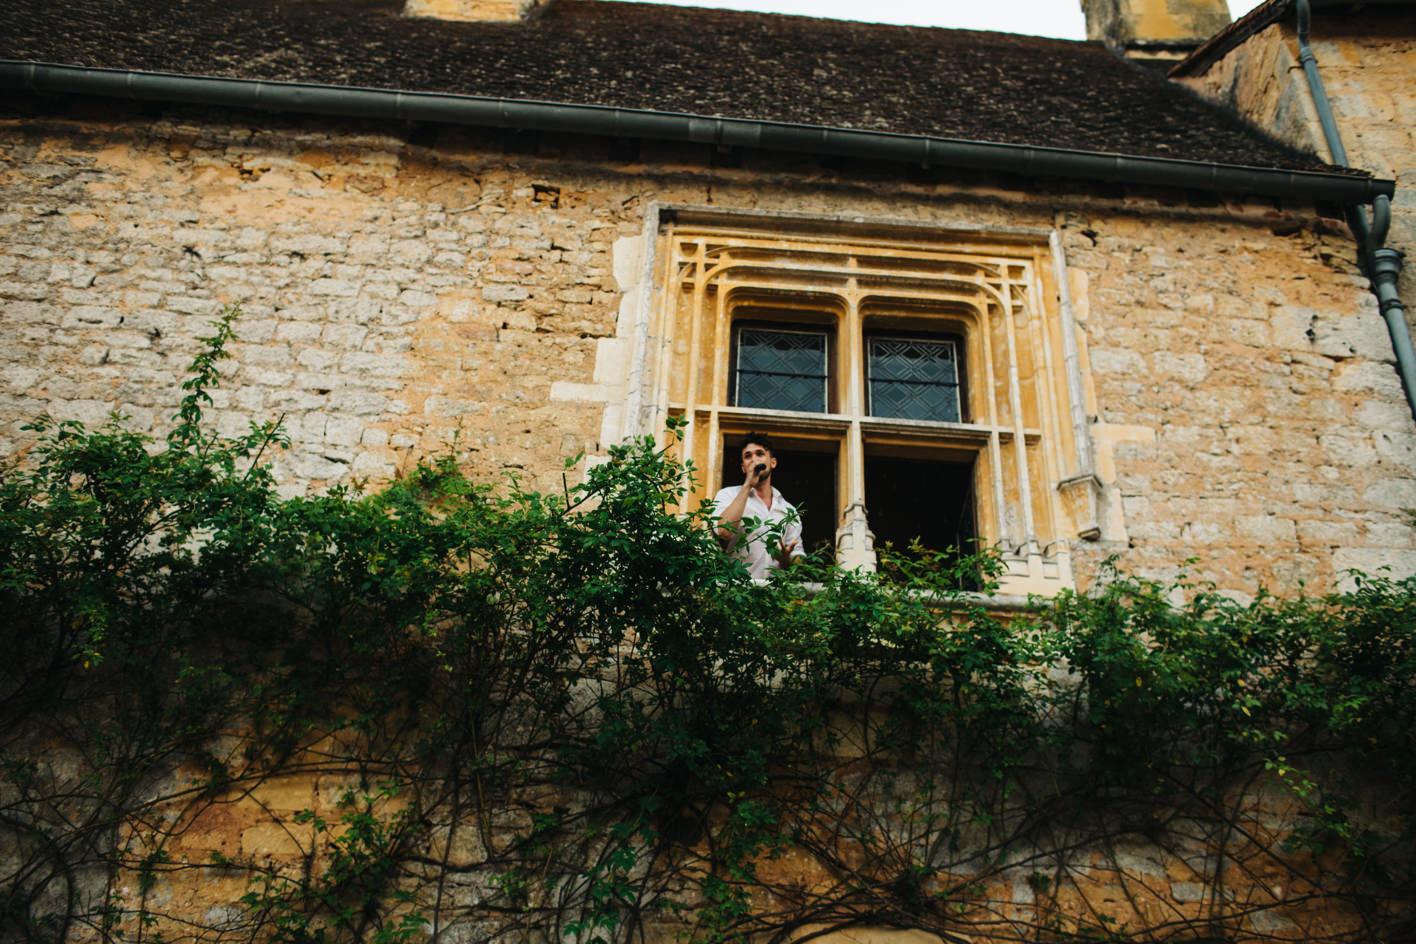 tenor sings from chateau window